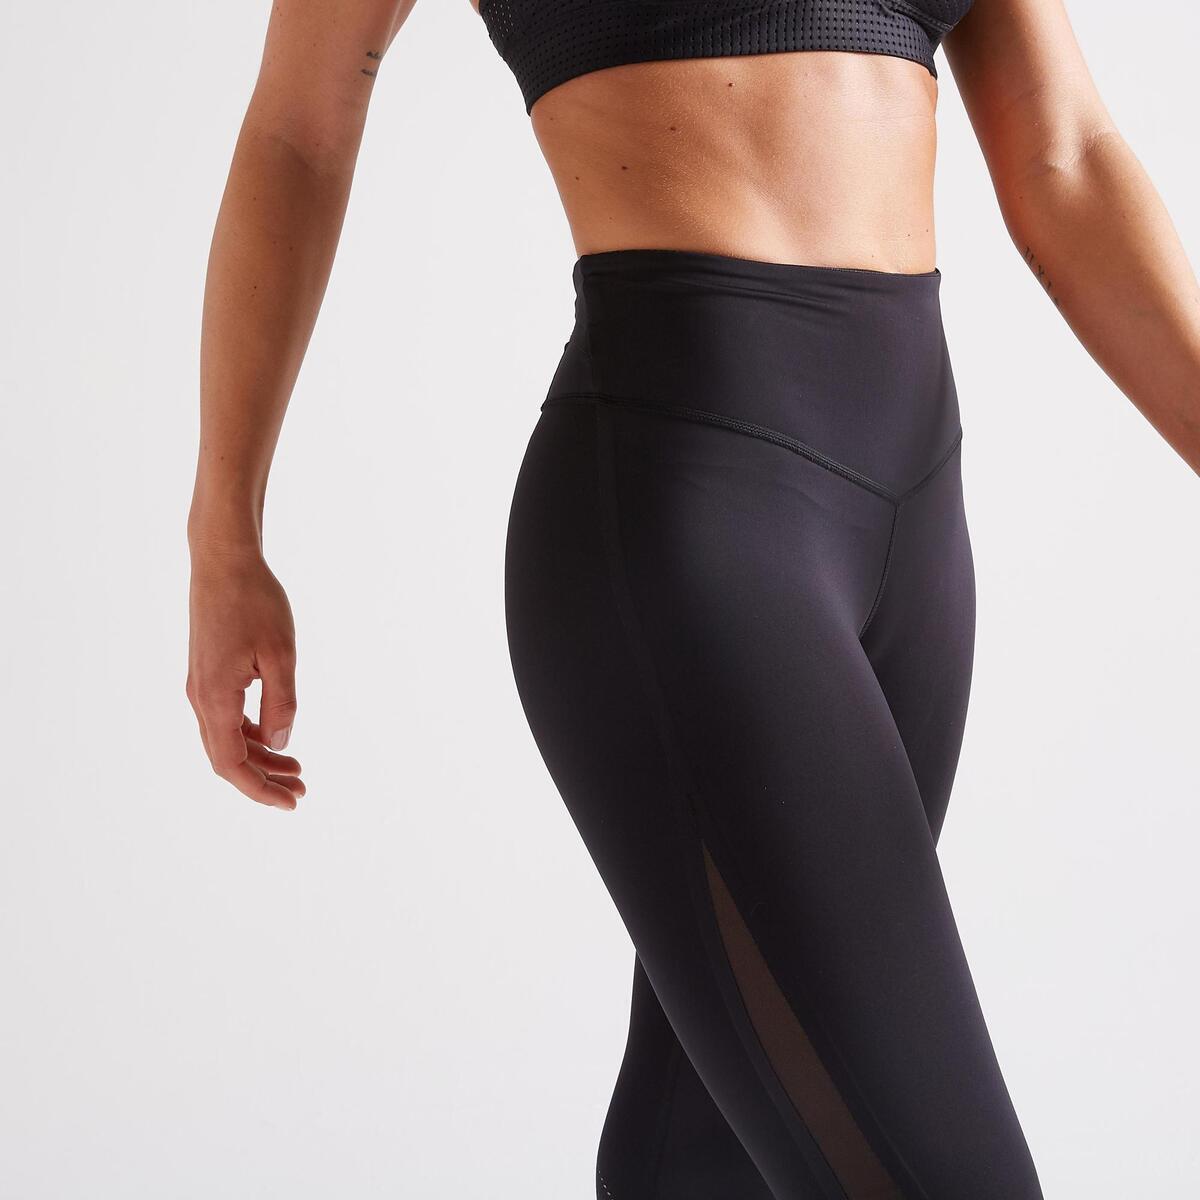 Bild 3 von 7/8-Leggings FLE 900 Fitness Cardio Damen schwarz